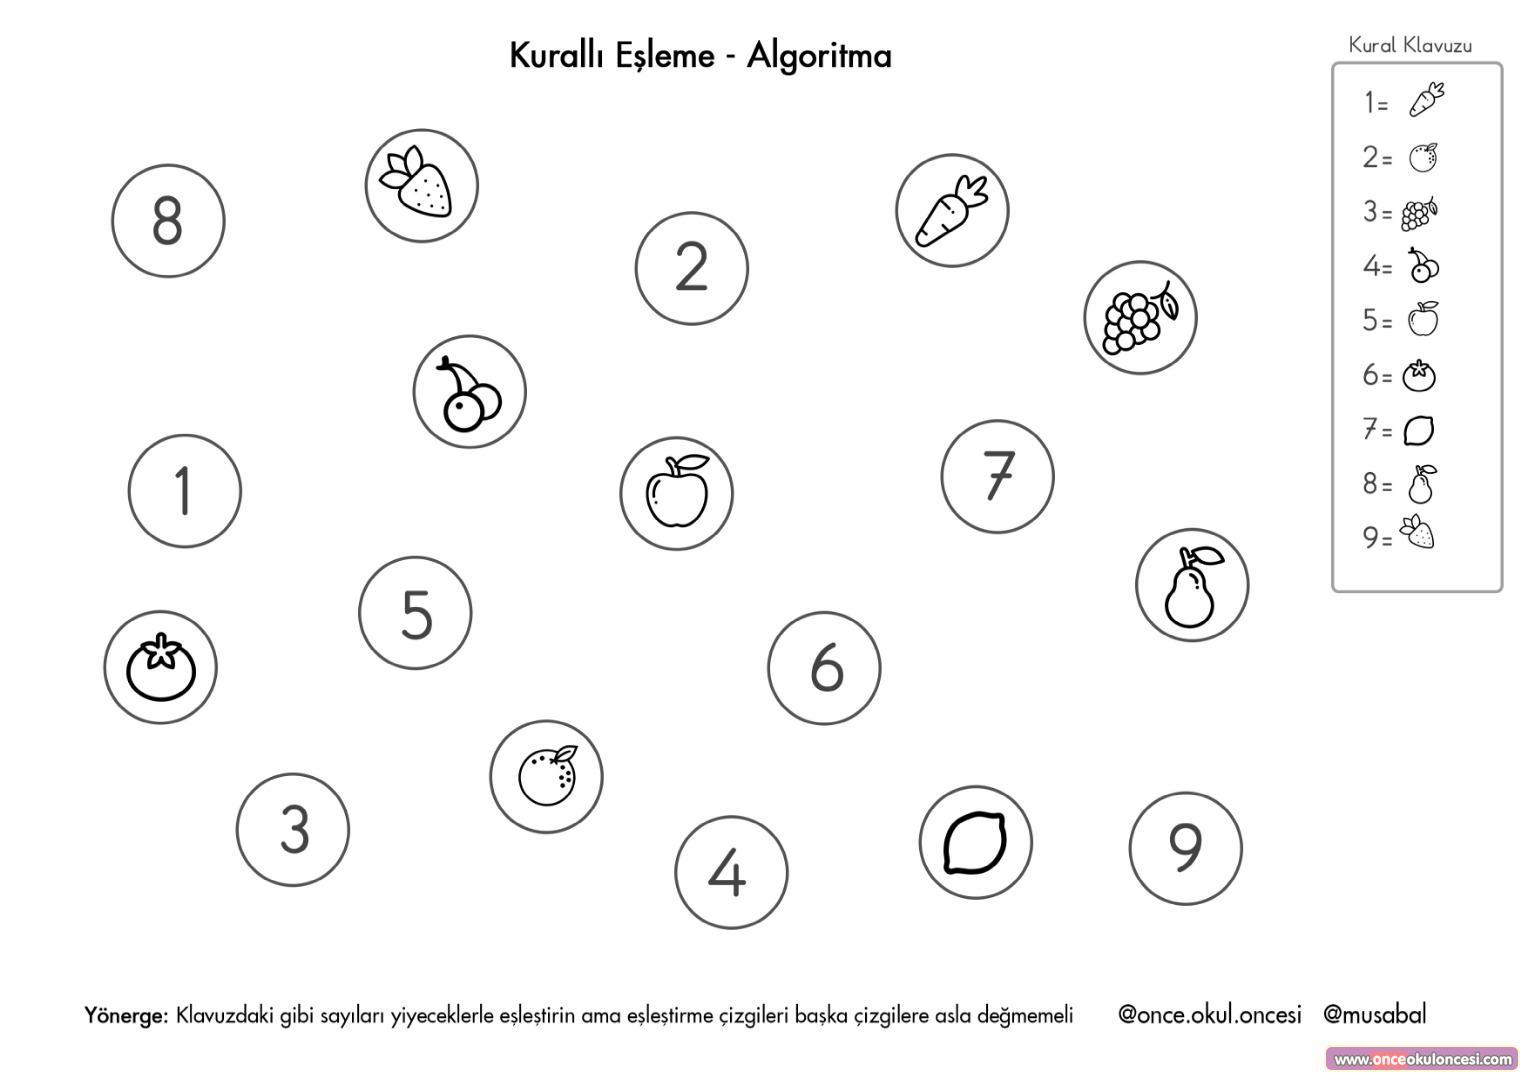 Kuralli Esleme Algoritma Calisma Sayfasi